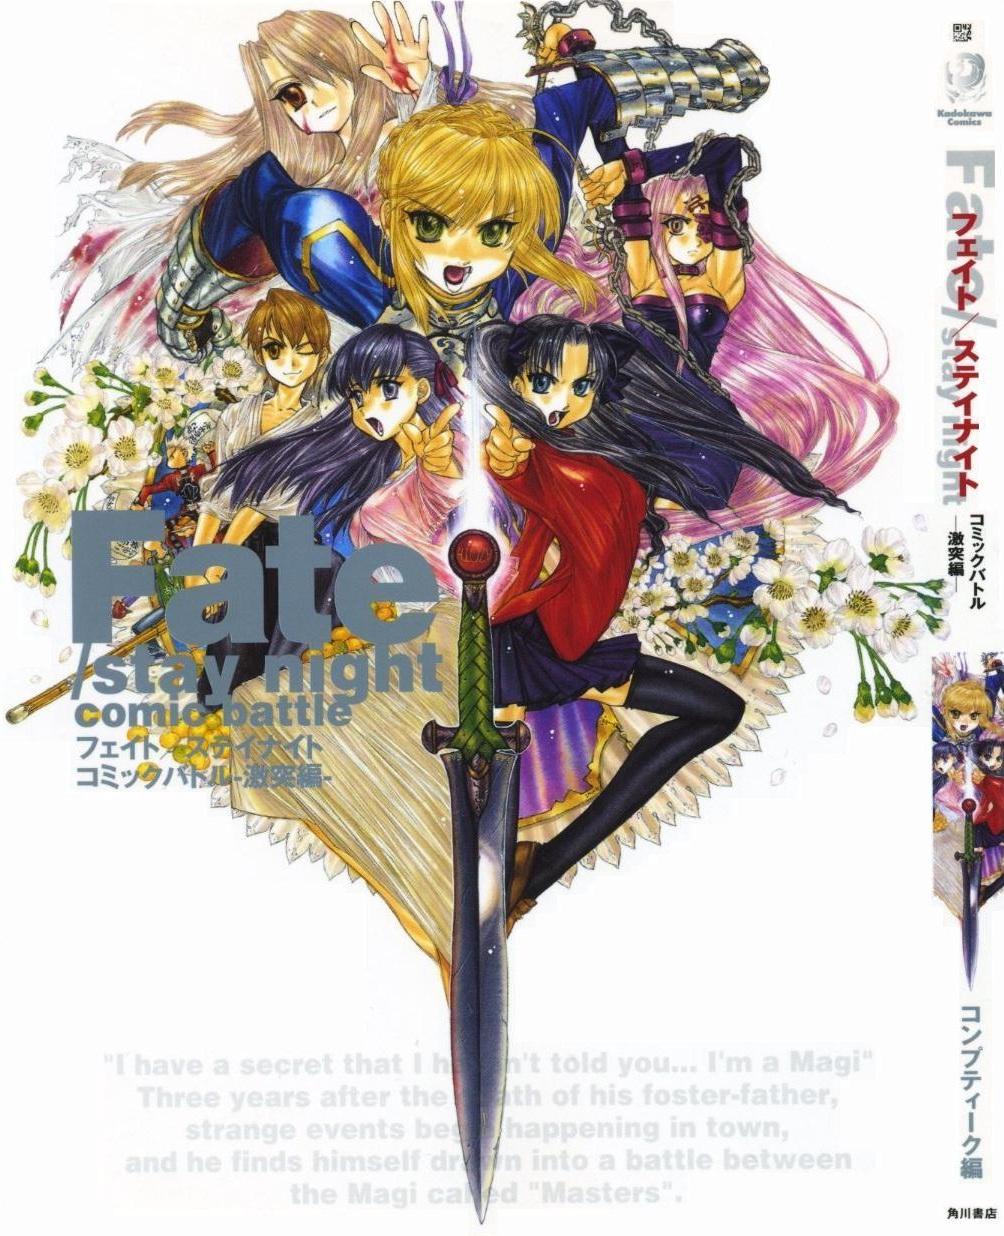 Fate/stay night Comic Battle